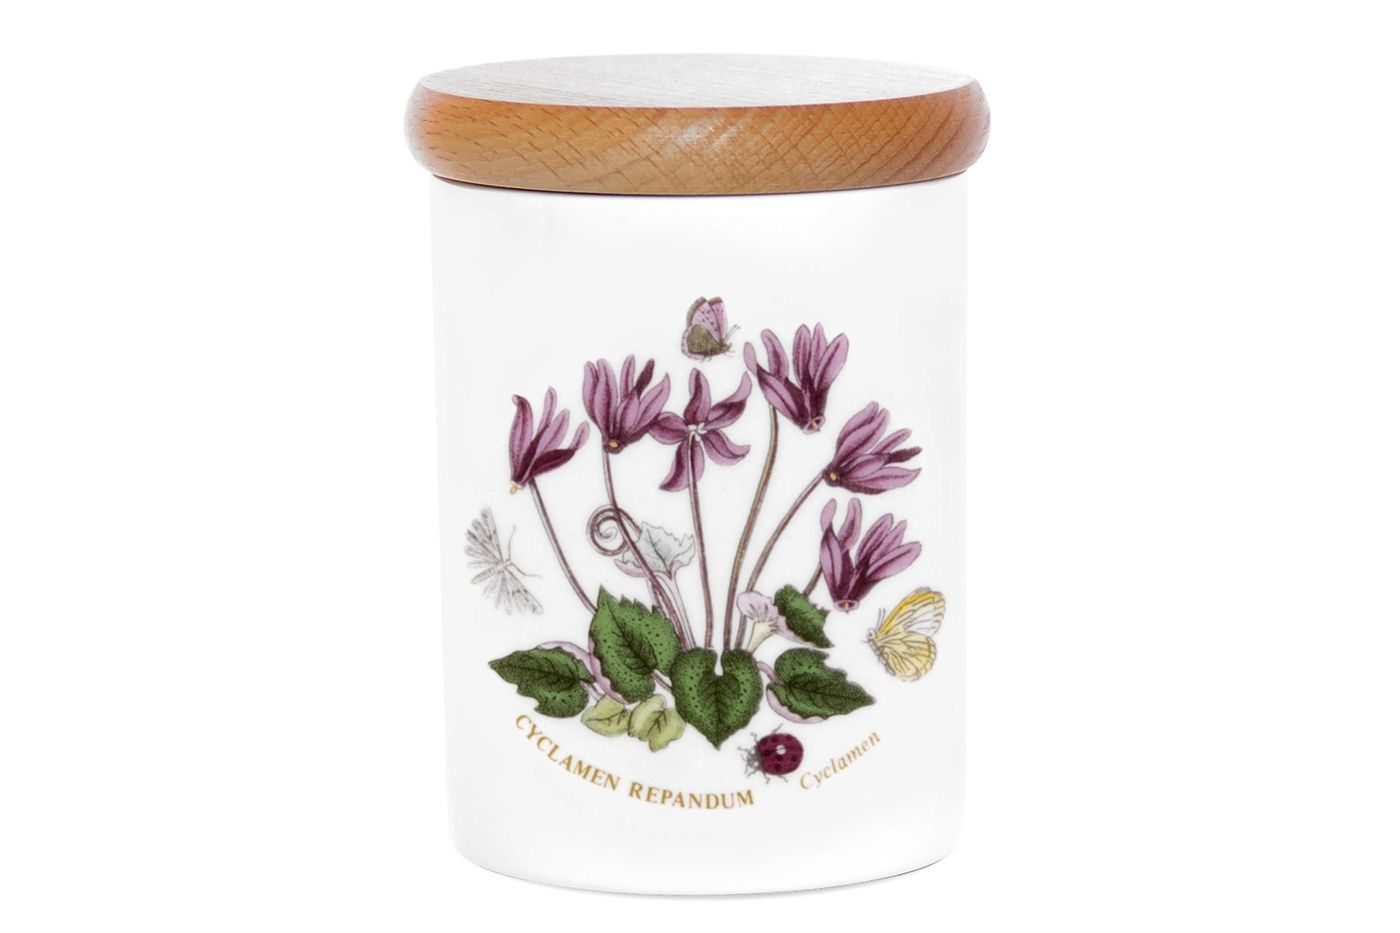 "Portmeirion Botanic Garden Storage Jar + Lid Cyclamen 3 1/4 x 4"" thumb 1"